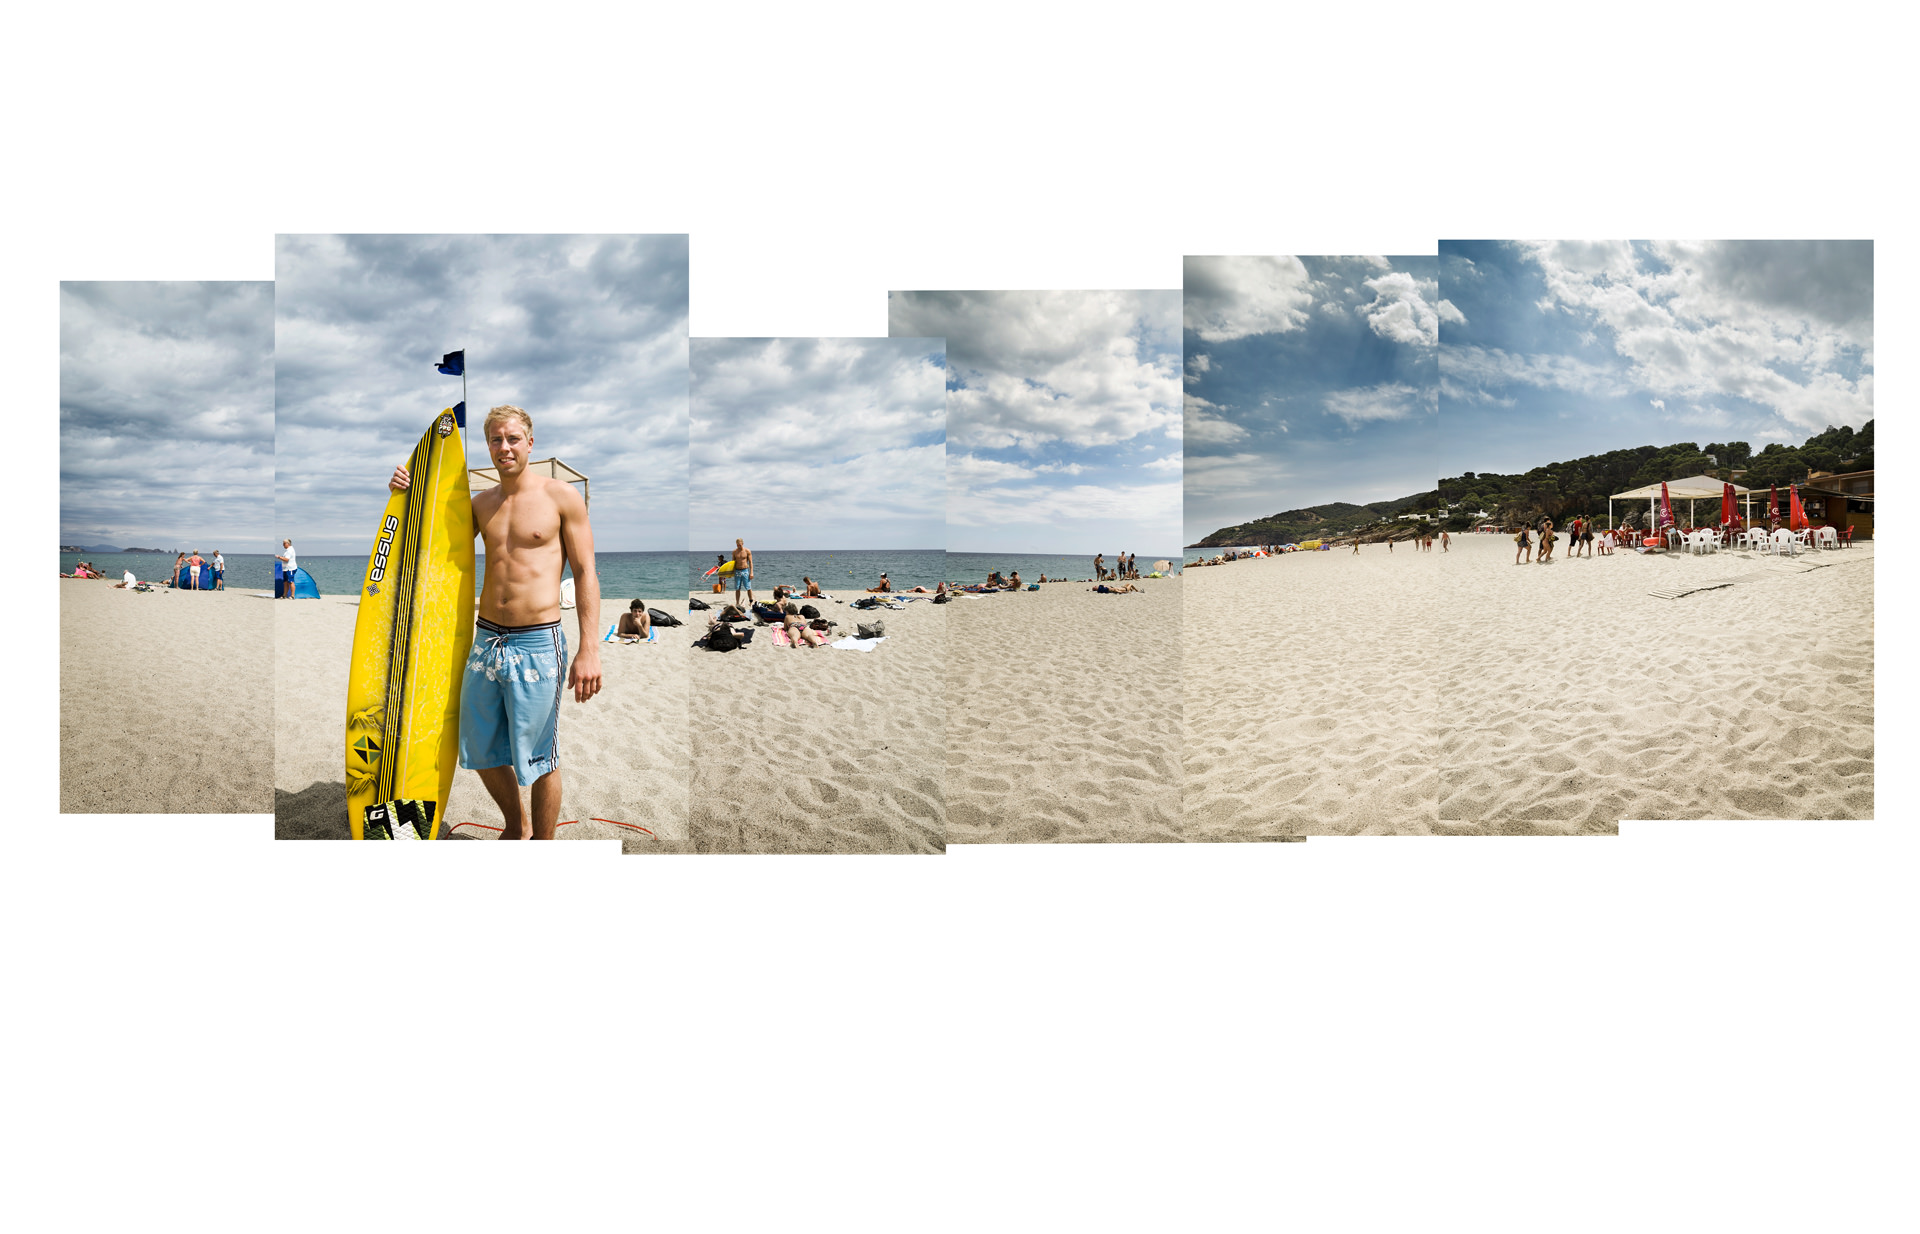 ©ankeluckmann643, ADAC, Reisemagazin, beach, spain, costa brava, people, landscape